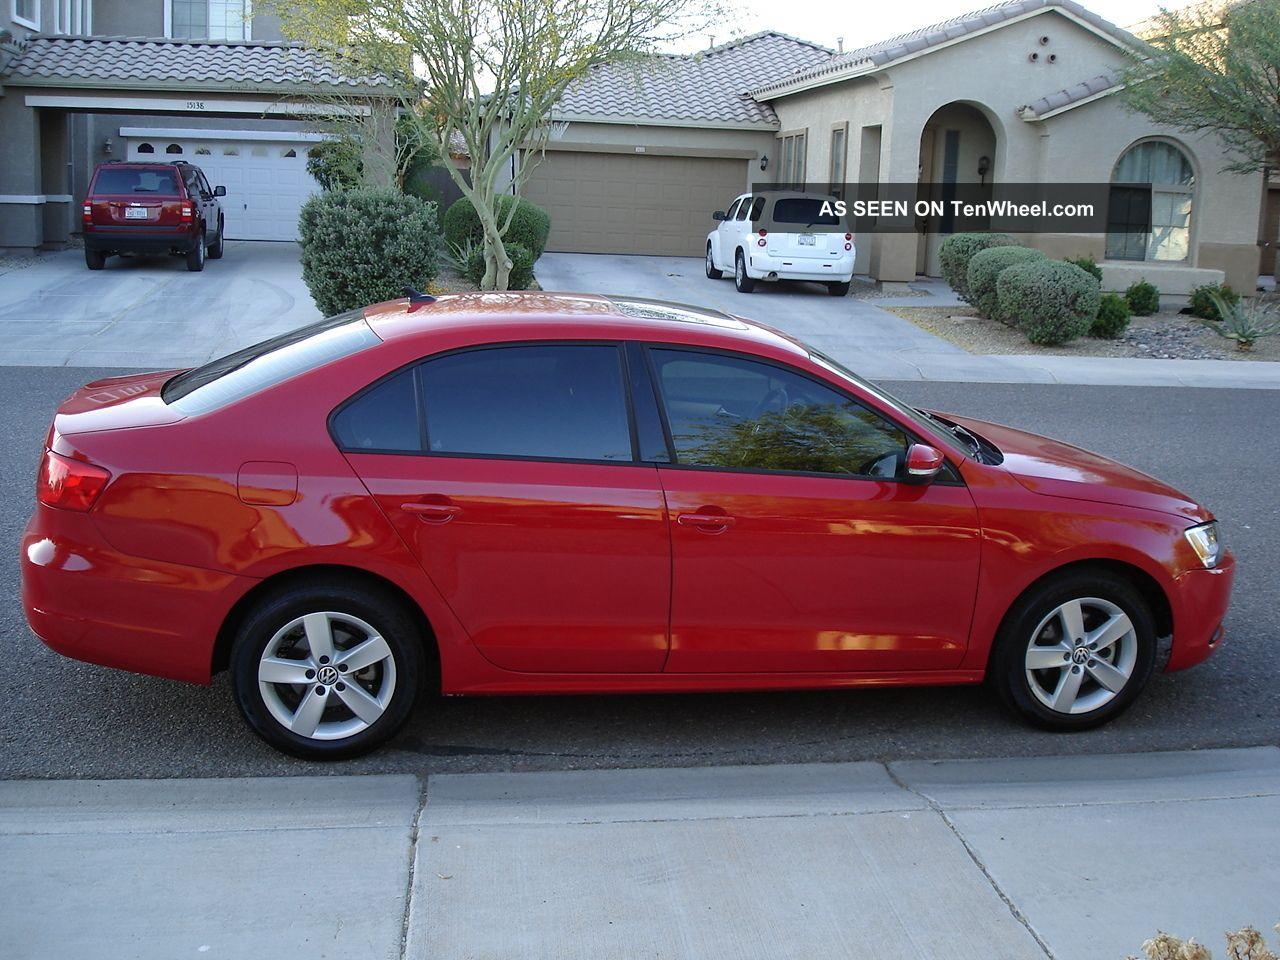 2011 volkswagen jetta tdi  turbo diesel  6 speed manual trans 2012 Hyundai Sonata GLS 2013 Hyundai Sonata